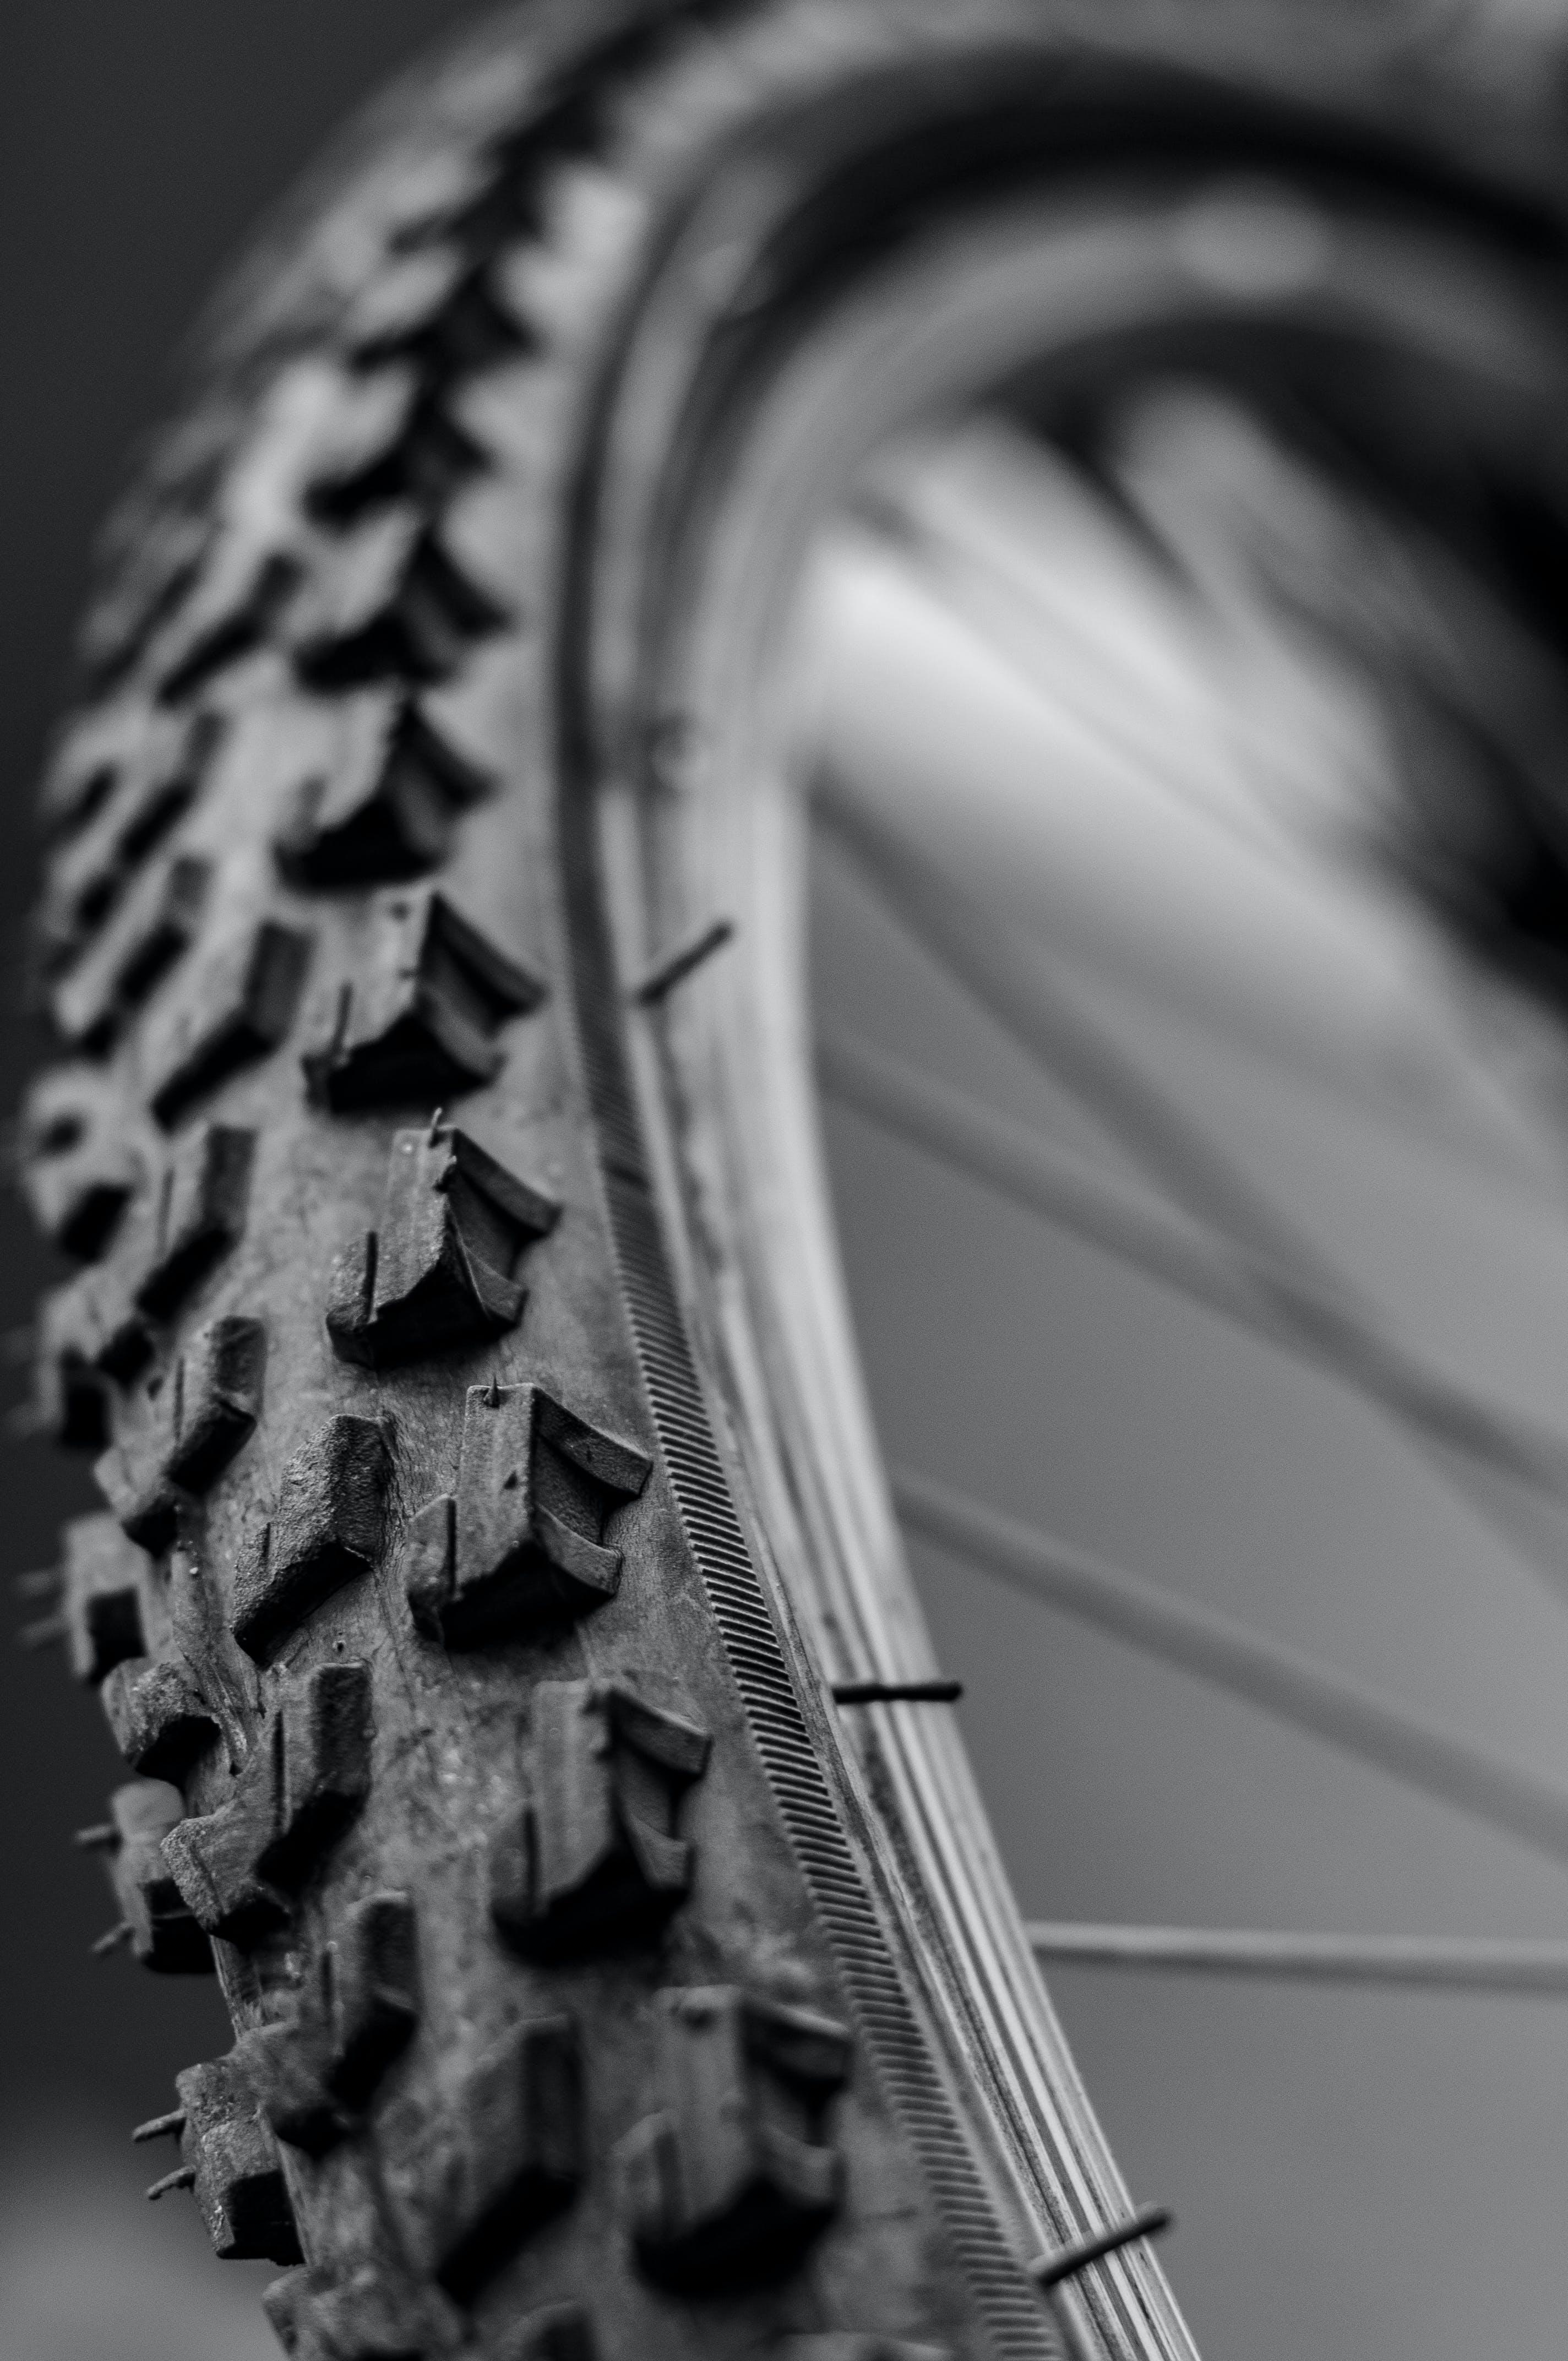 Free stock photo of activity, adulation, Ball Bearing, bicycle